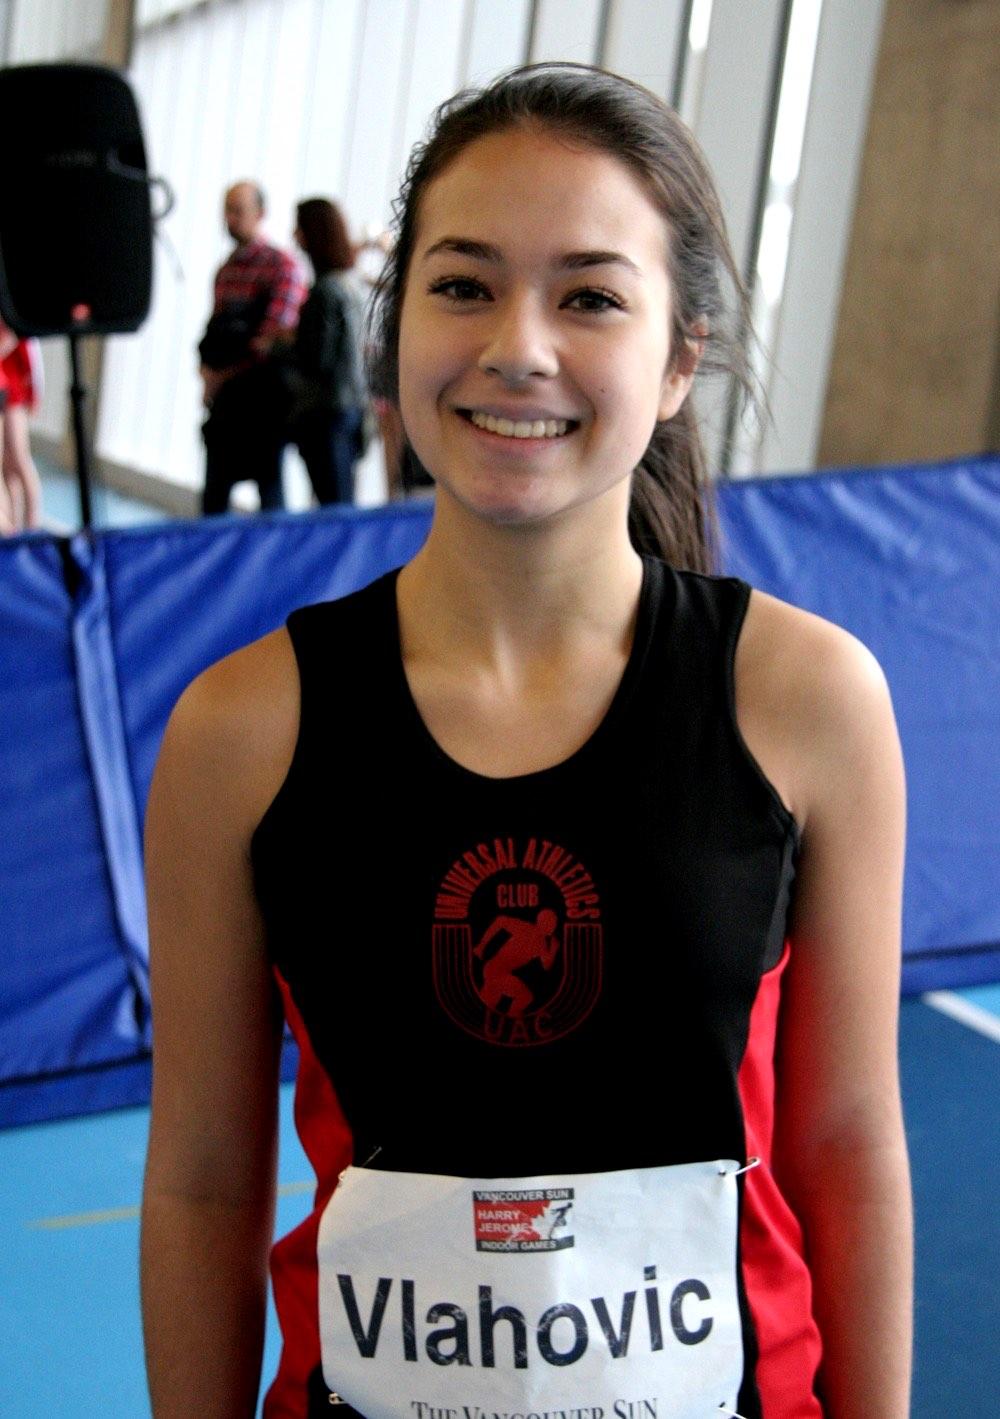 Katarina Vlahovic at Harry Jerome Indoor Games